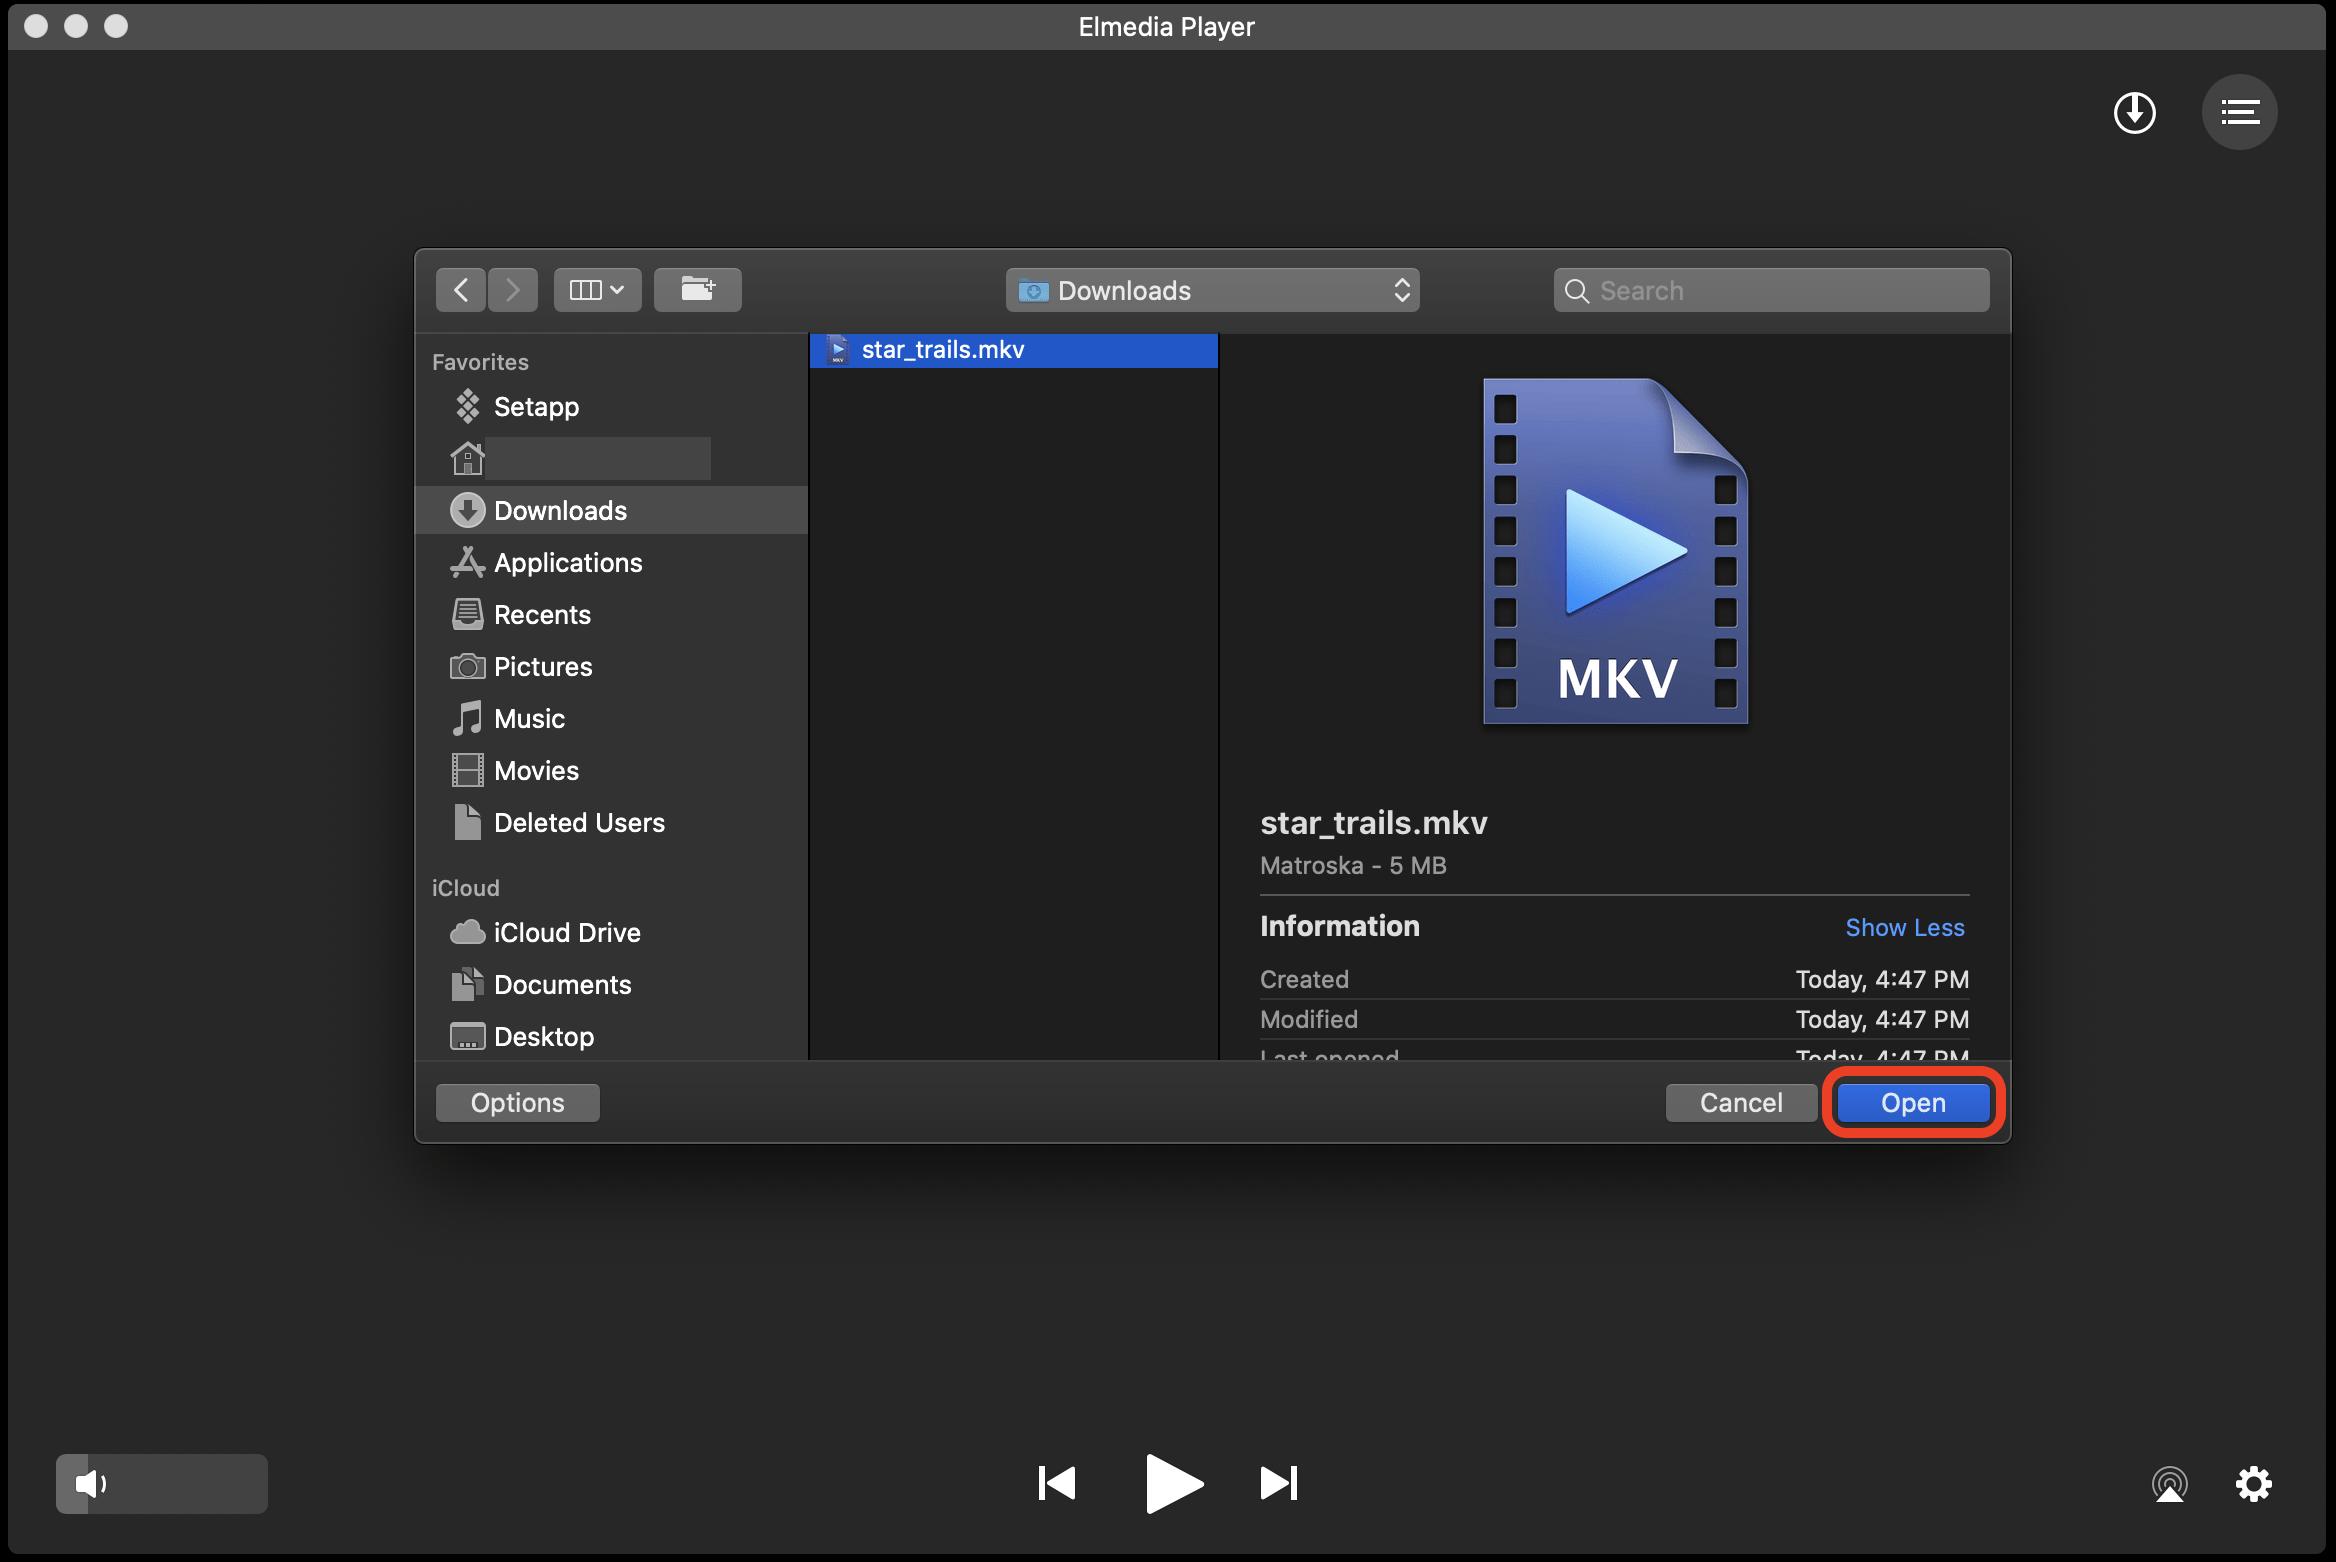 Open MKV files with Elmedia Player